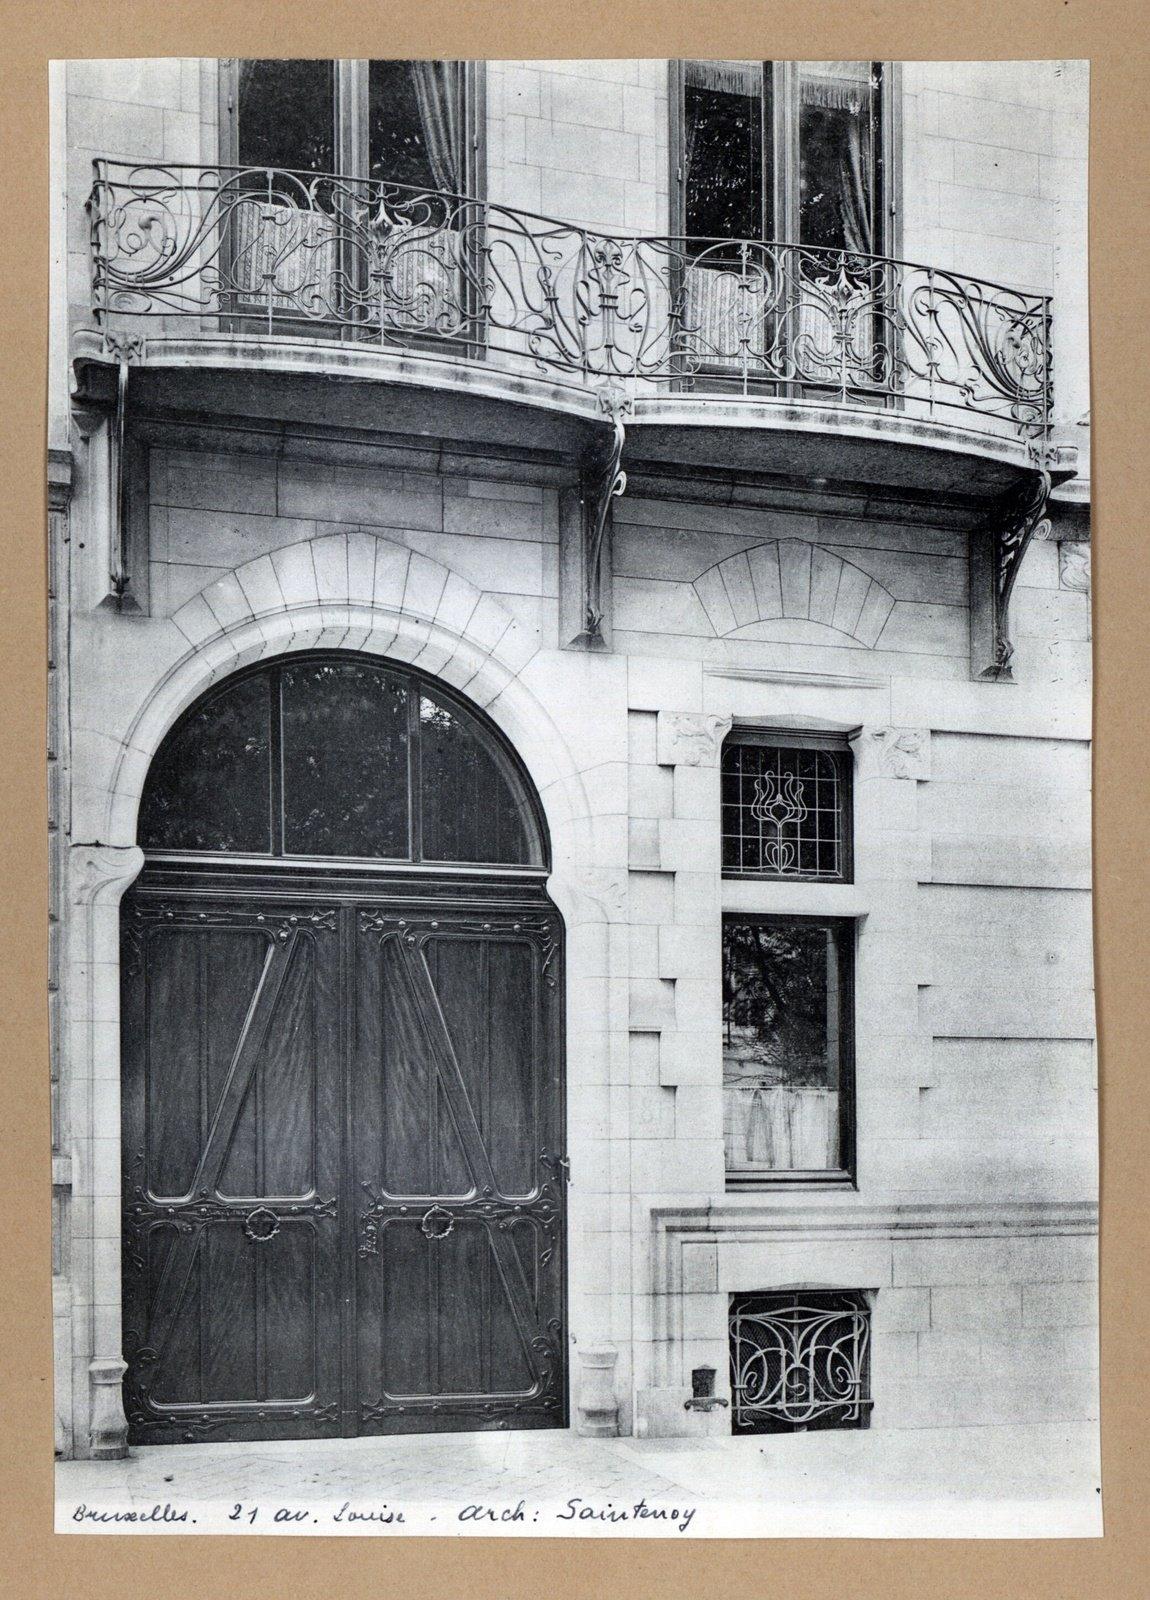 Bruxelles maison, 21 av. Louise-architecte: Saintenoy, Ghent University Library, CC BY-SA